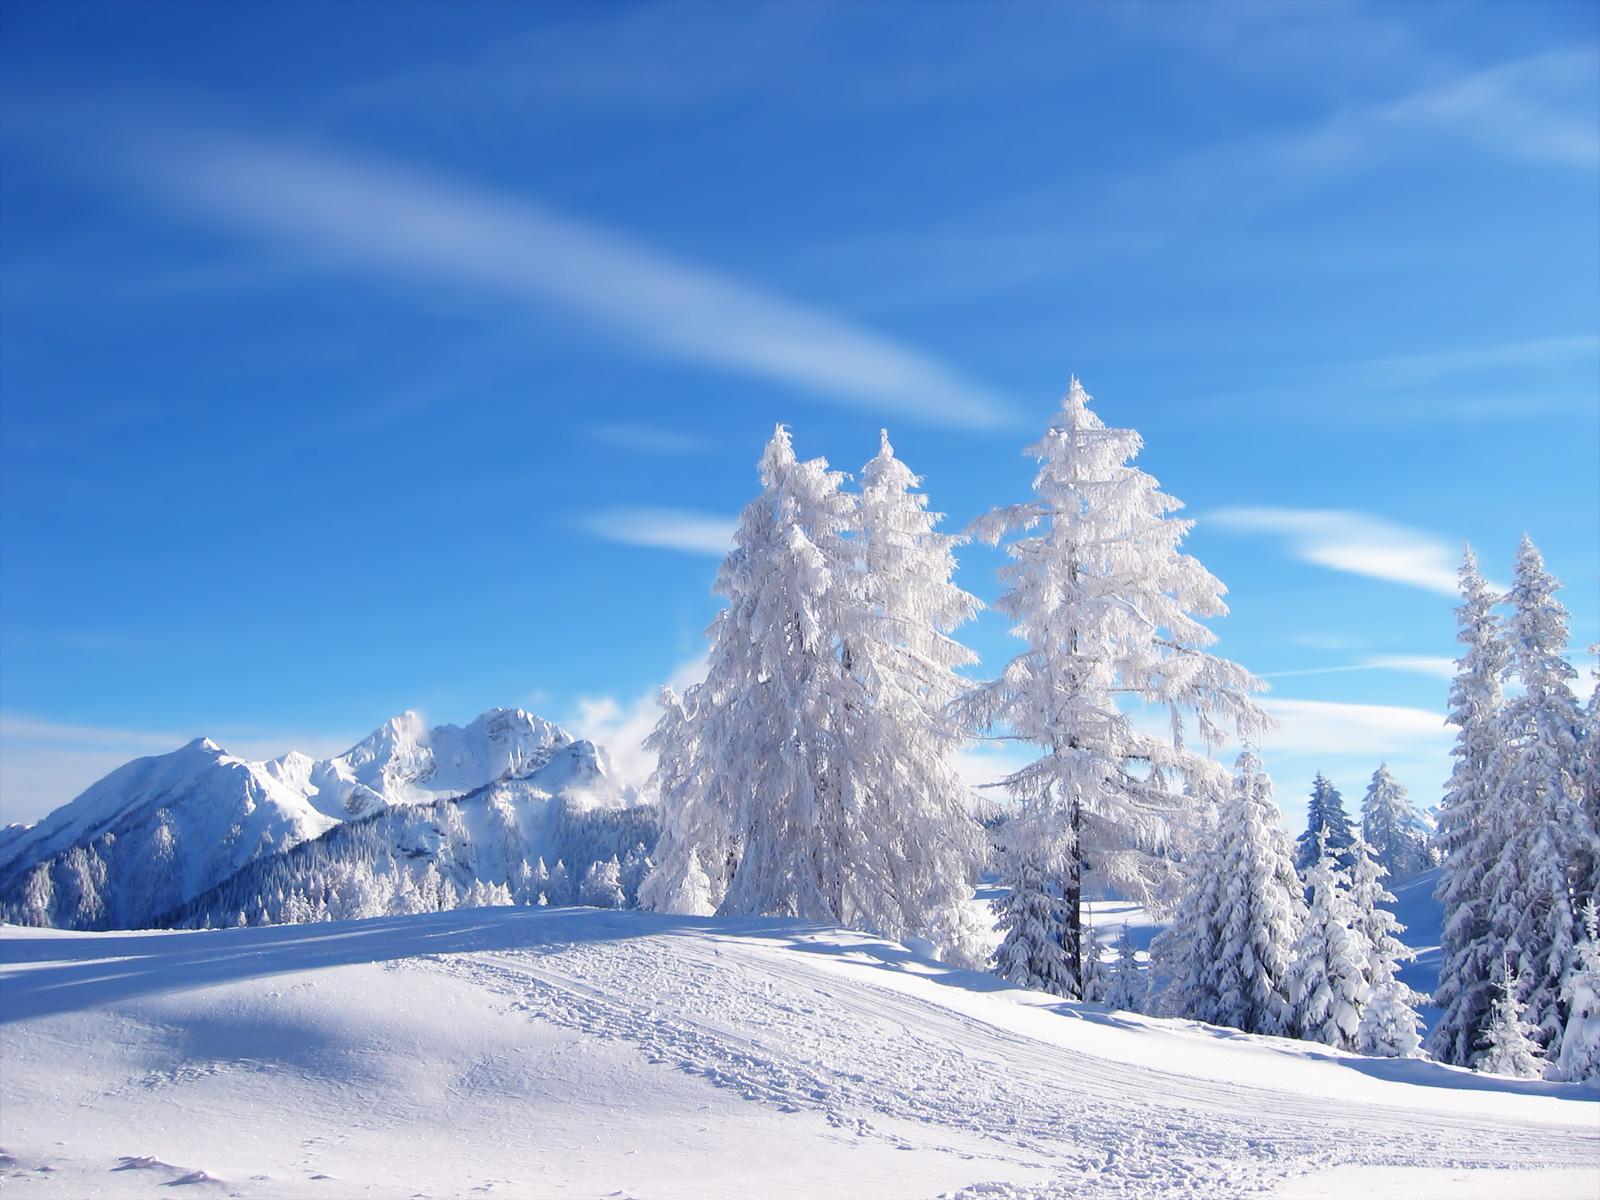 Winter Wallpapers HD Winter Wallpapers HD 1600x1200